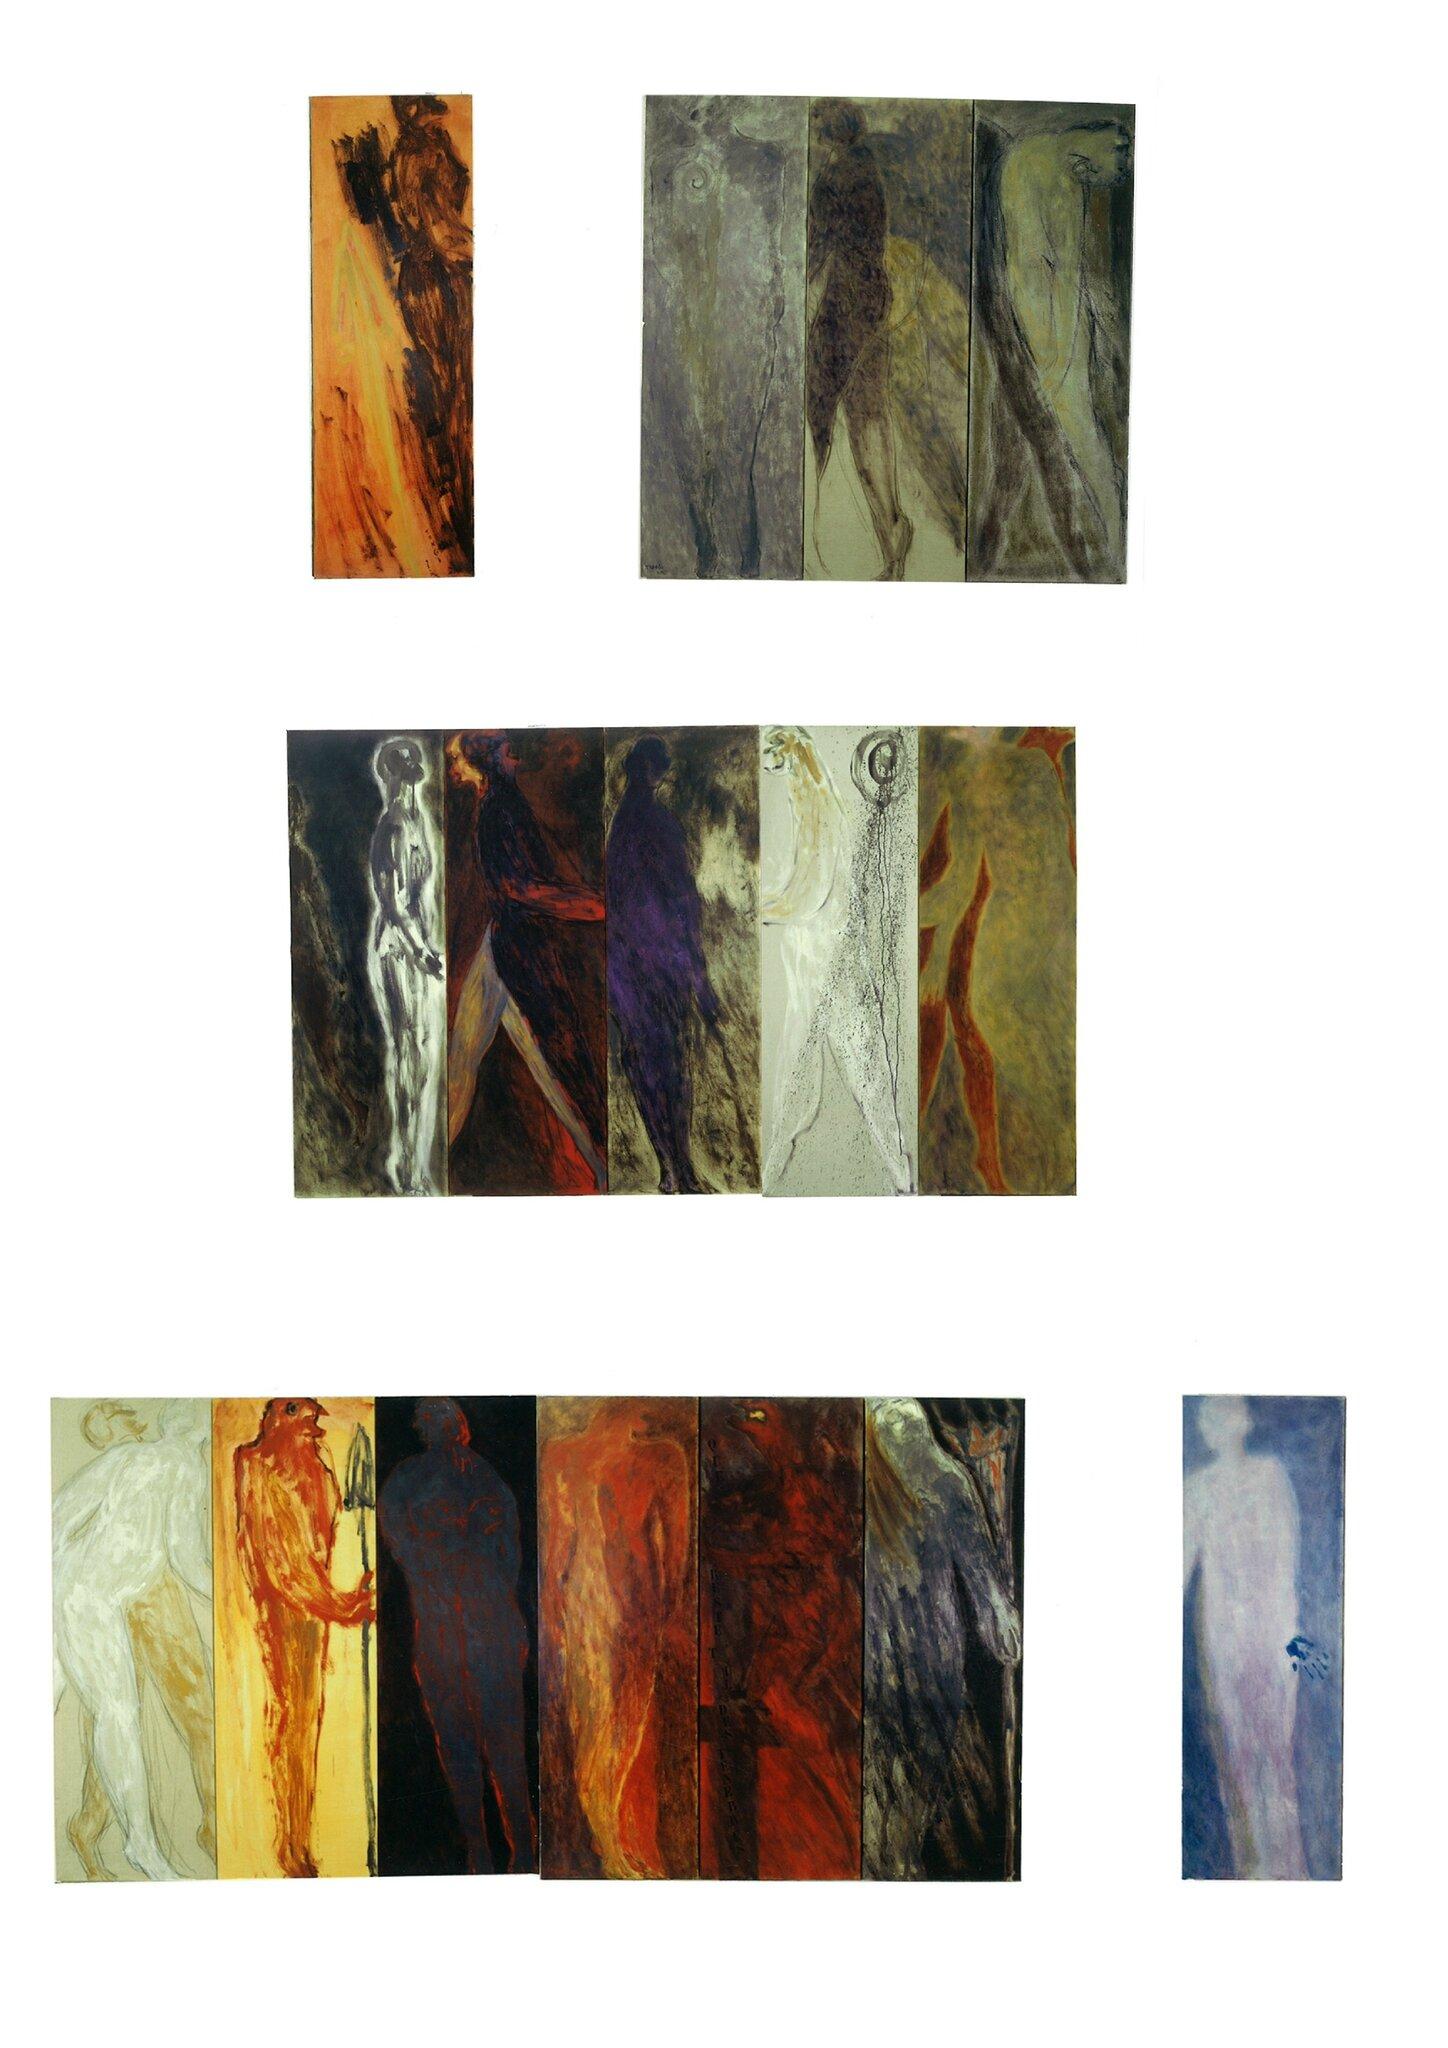 La Chambre des Rencontres /The Room of Encounters 1994-1999 - 32 oil on canvas 150x50cm each/chacune- detail